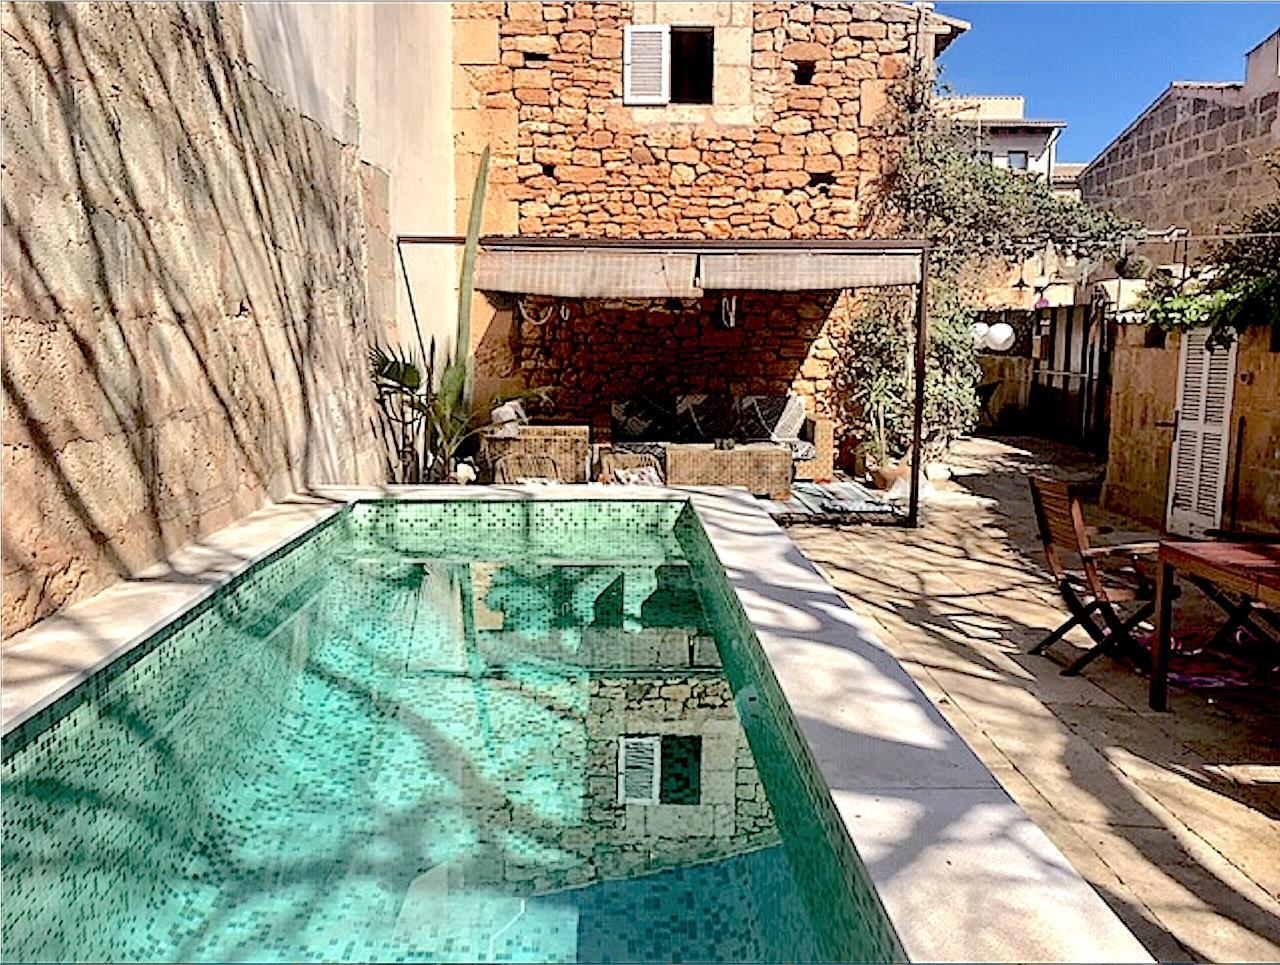 CASA CONCHA SES SALINES romantisches Stadthaus für 4 Personen Pool Patio